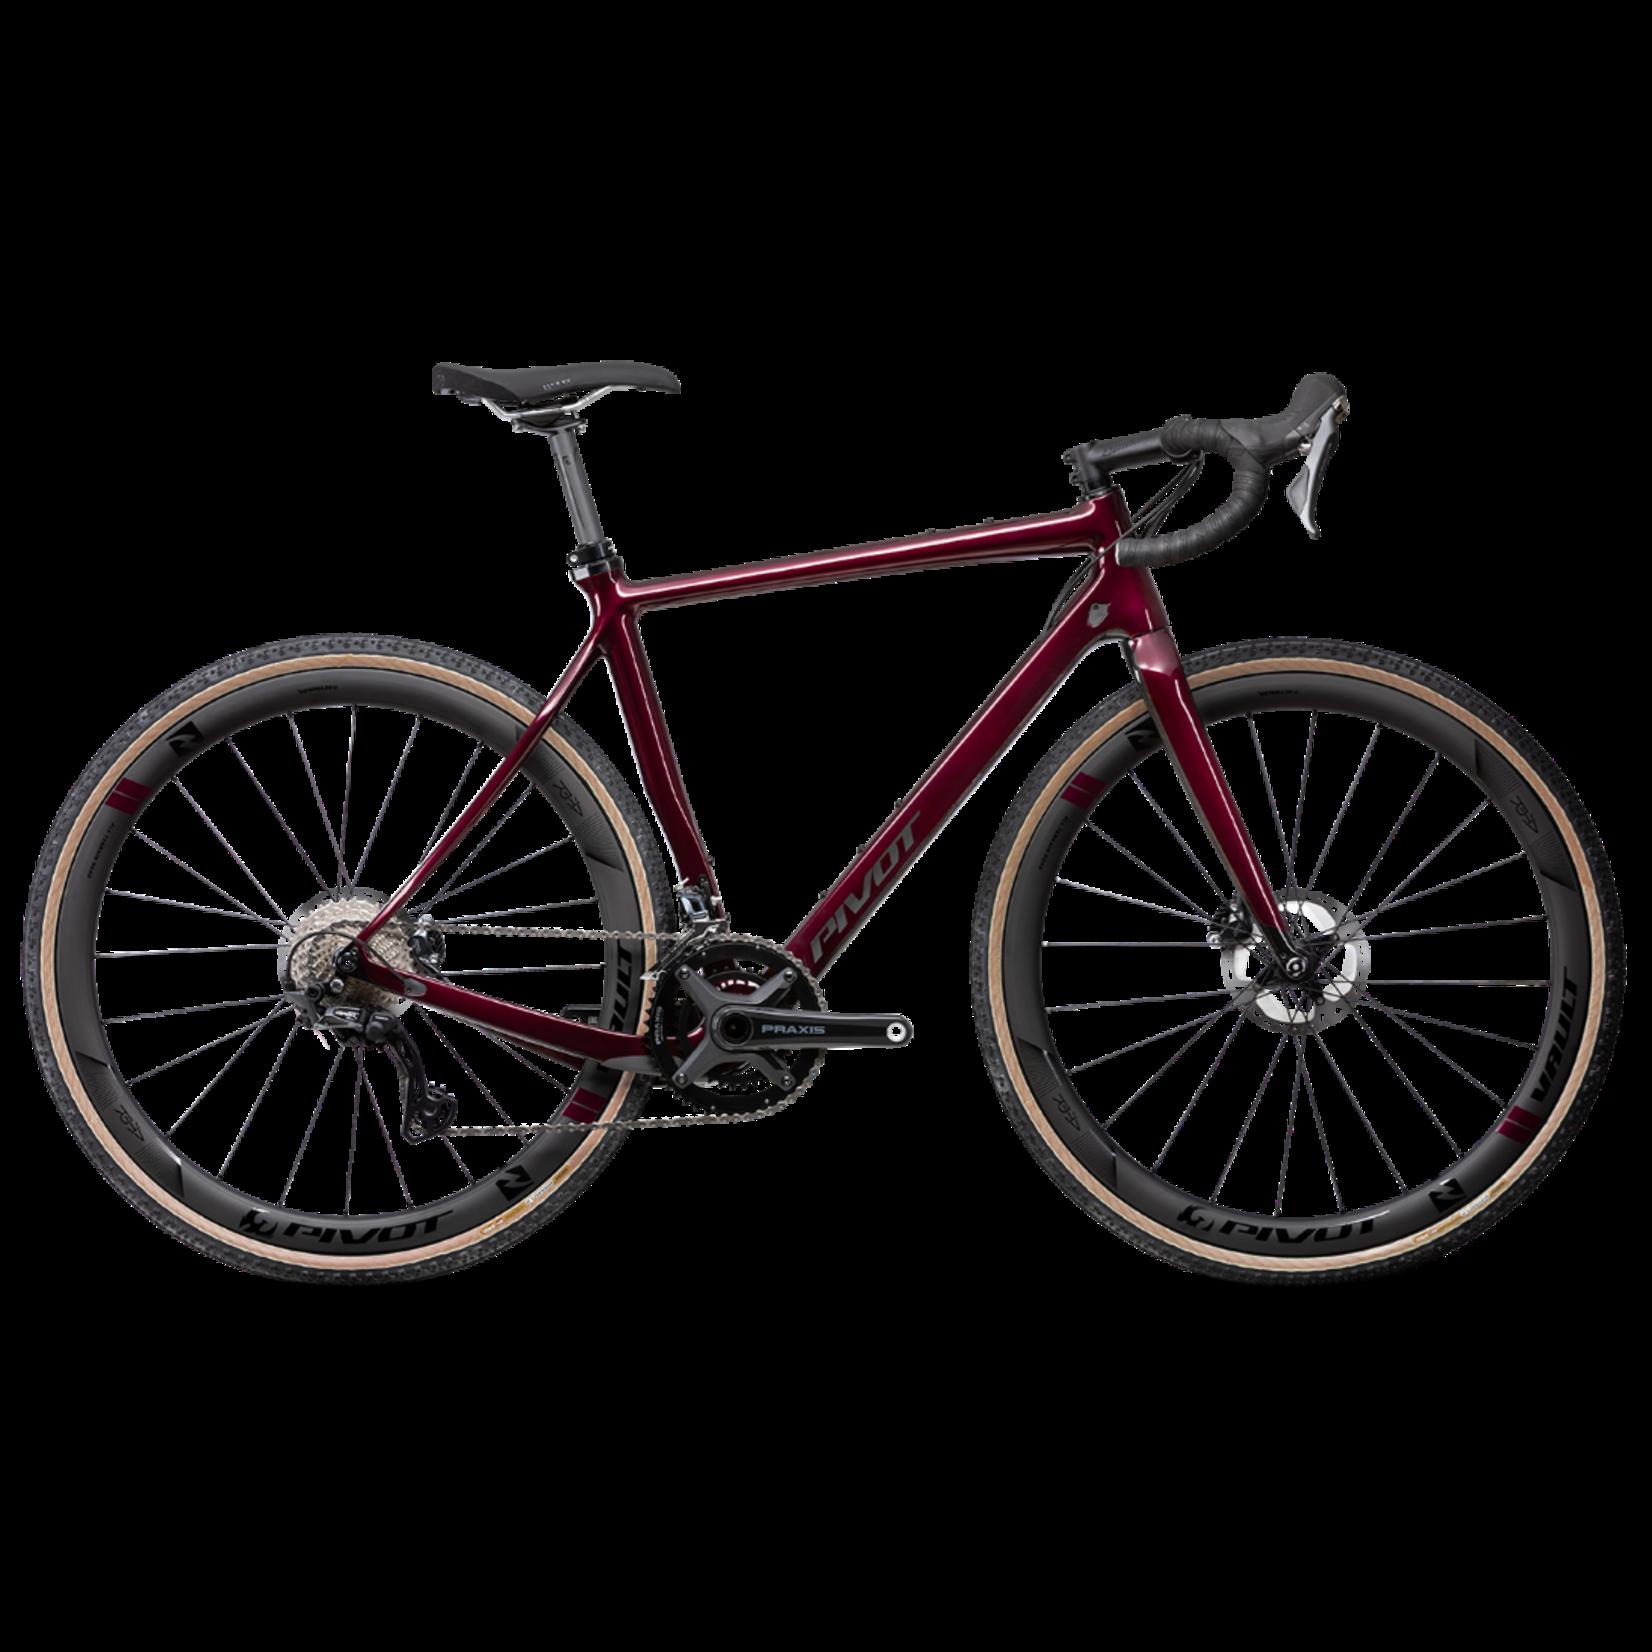 Pivot Pivot Vault Pro GRX 810 w/ Carbon Wheels XL